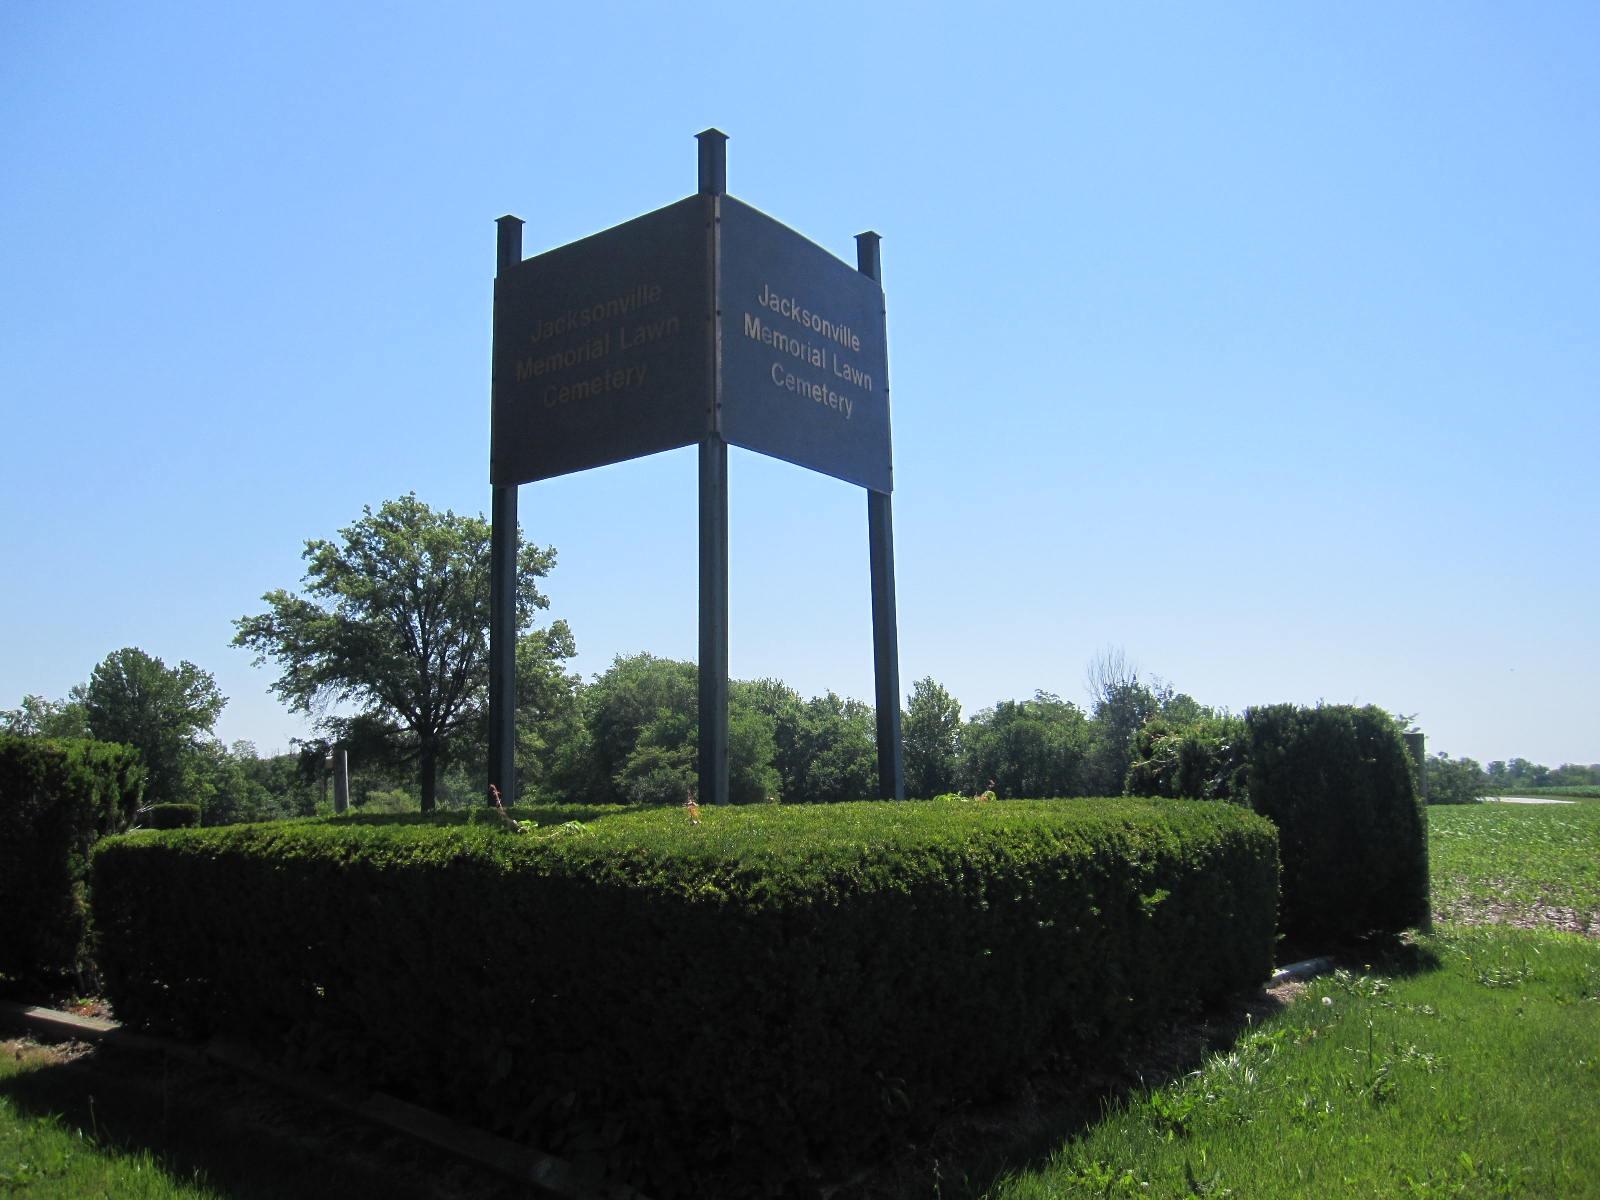 Jacksonville Memorial Lawn Cemetery